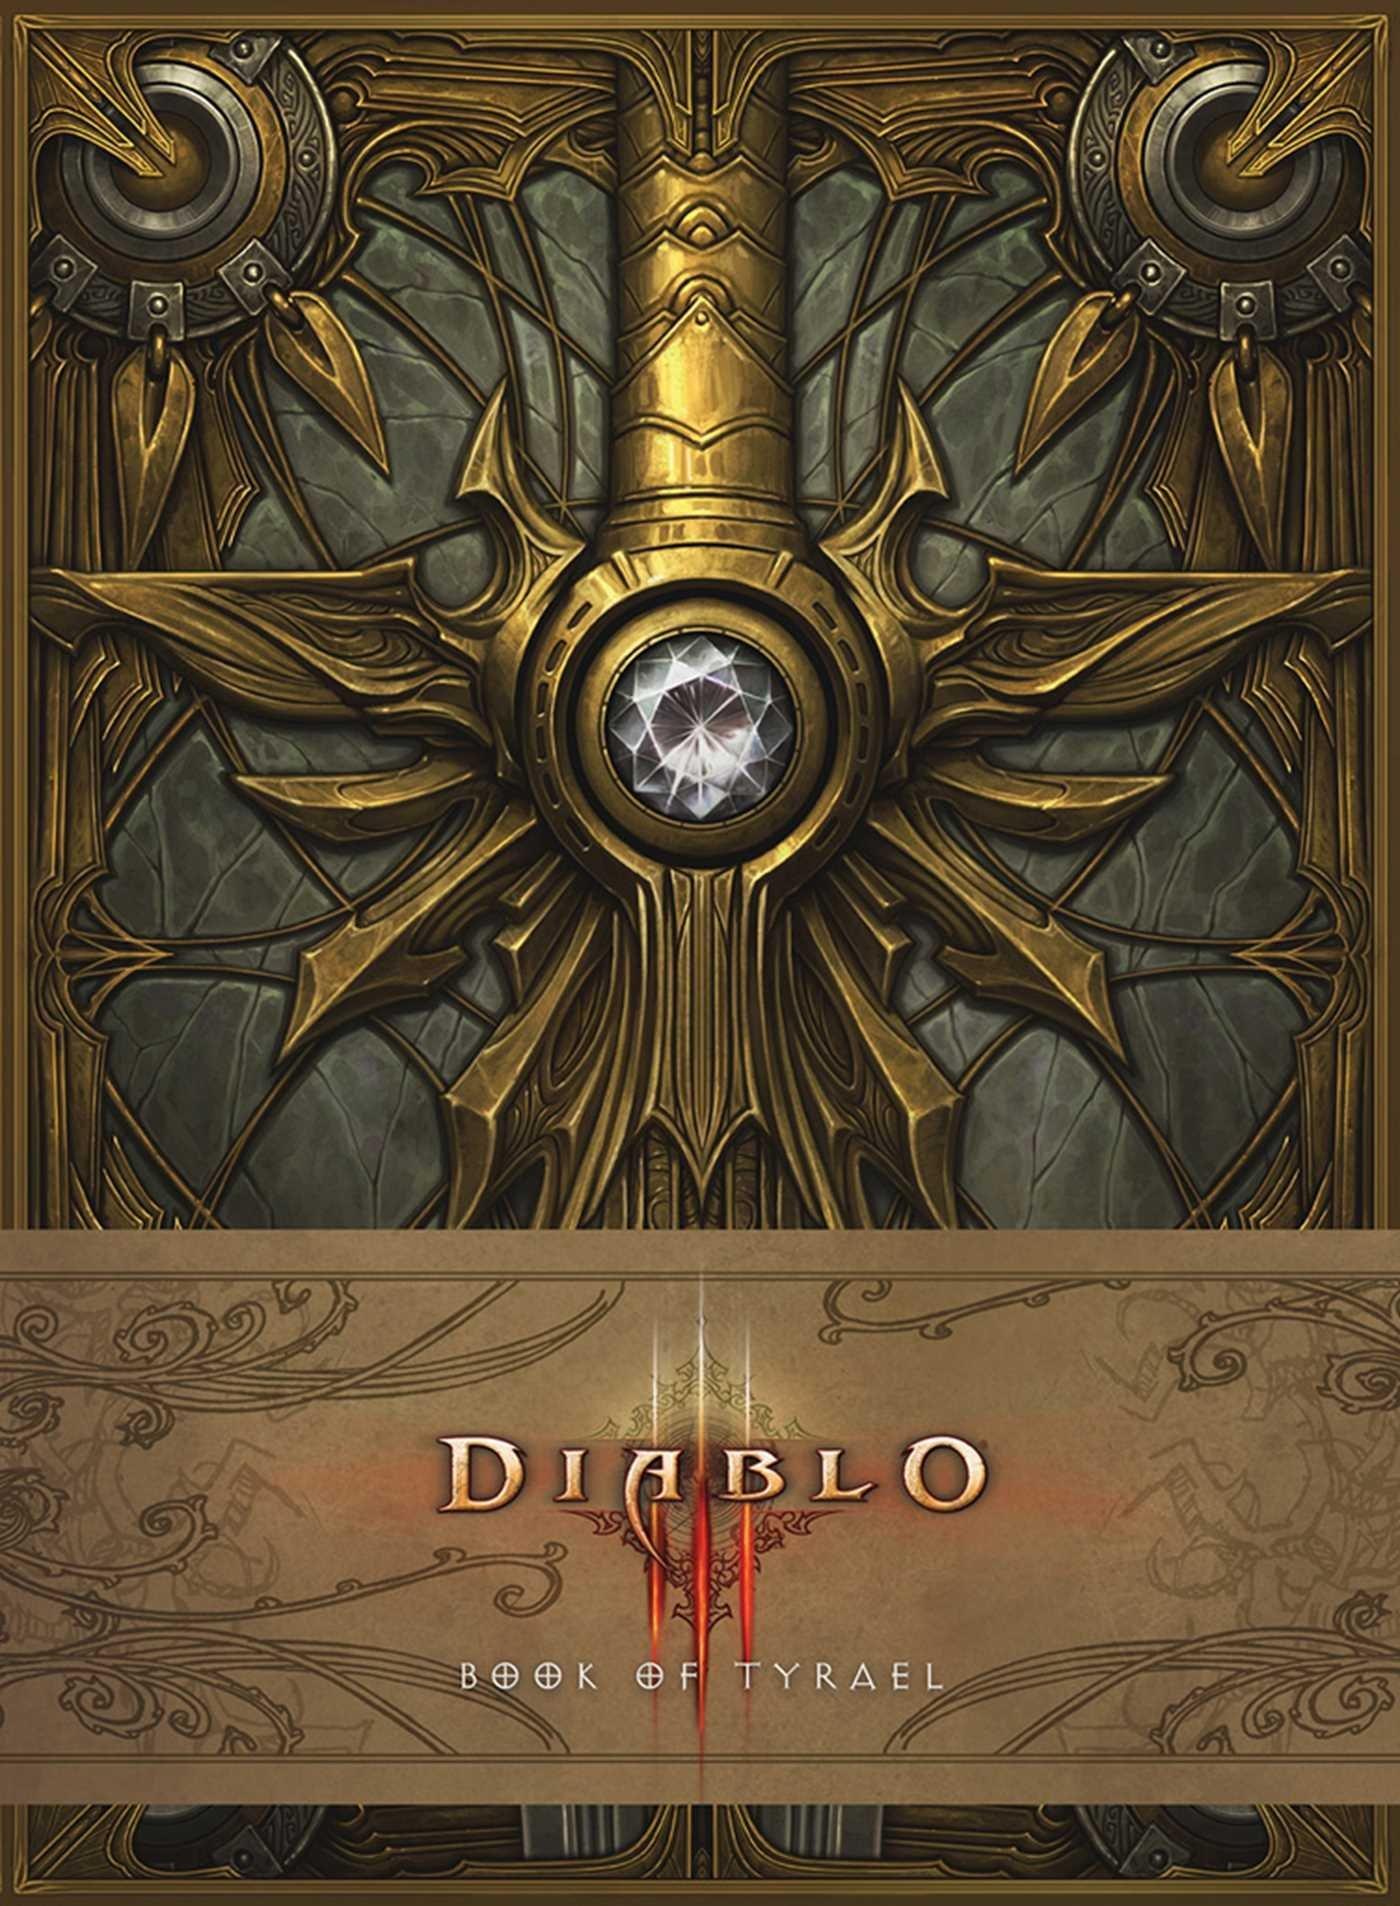 Diablo III: Book of Tyrael (Book) Review